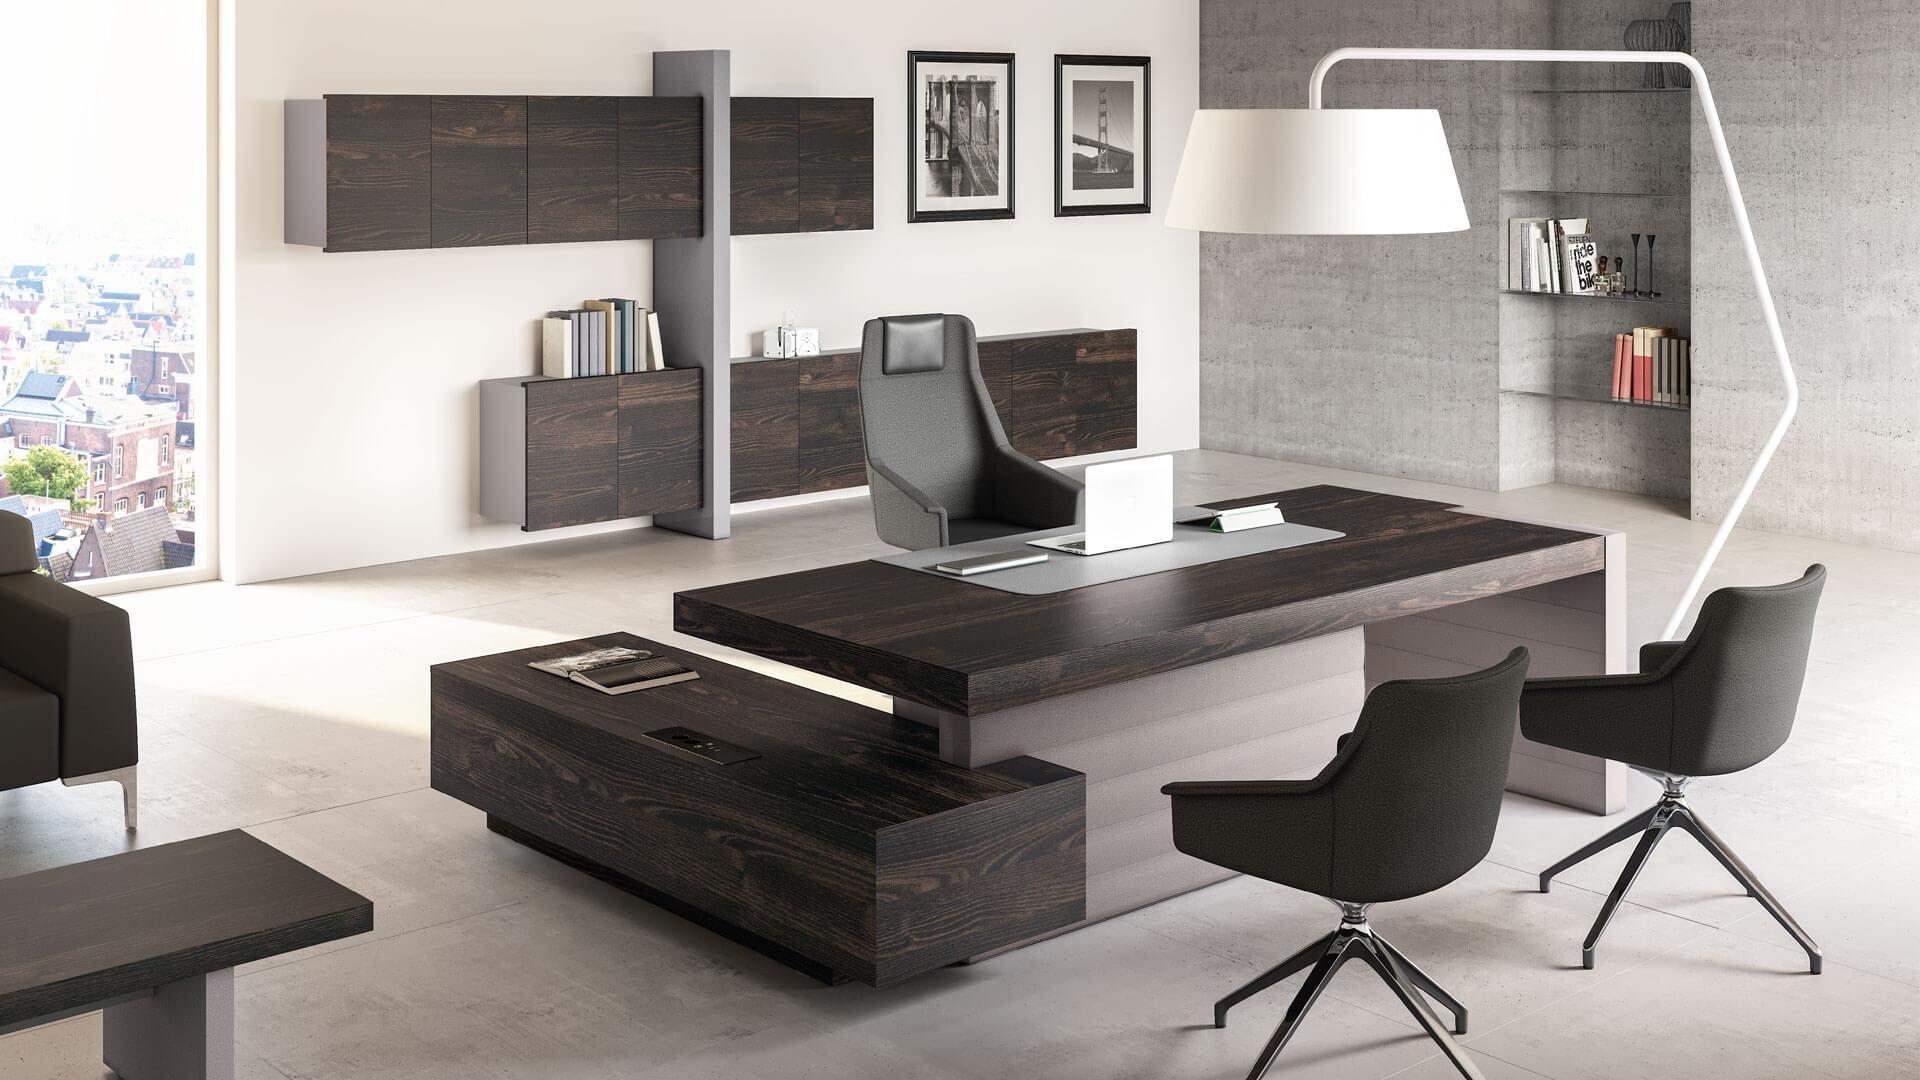 arredamento ufficio per verona vicenza padova. Black Bedroom Furniture Sets. Home Design Ideas